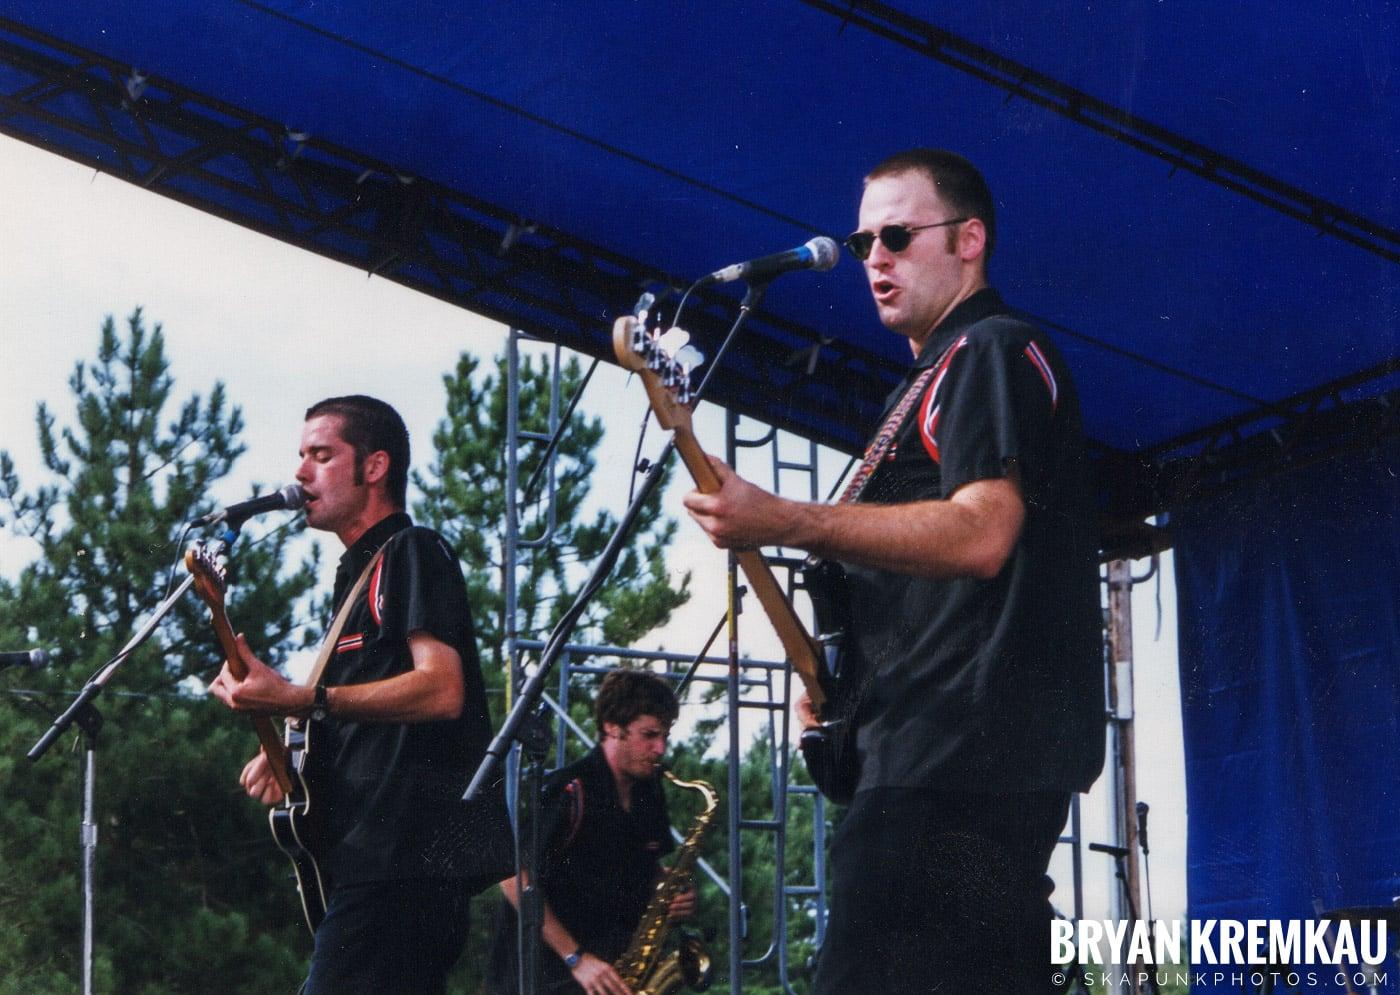 The Planet Smashers @ New England Ska Fest 98, Westford, MA - 8.22.98 (4)